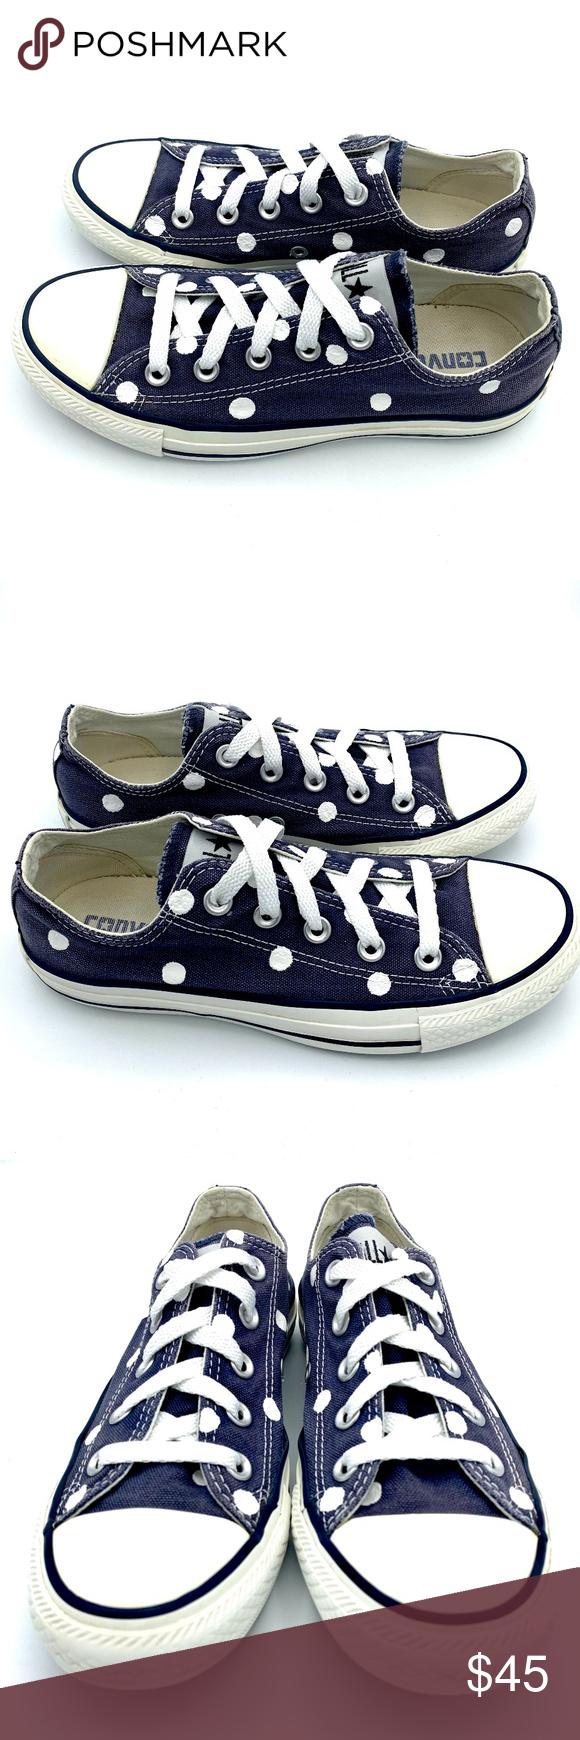 73e1ab8ee6c3 Converse 6 NAVY BLUE Polka Dot Chuck Taylor AS  2 Hand painted unisex Converse  Chuck